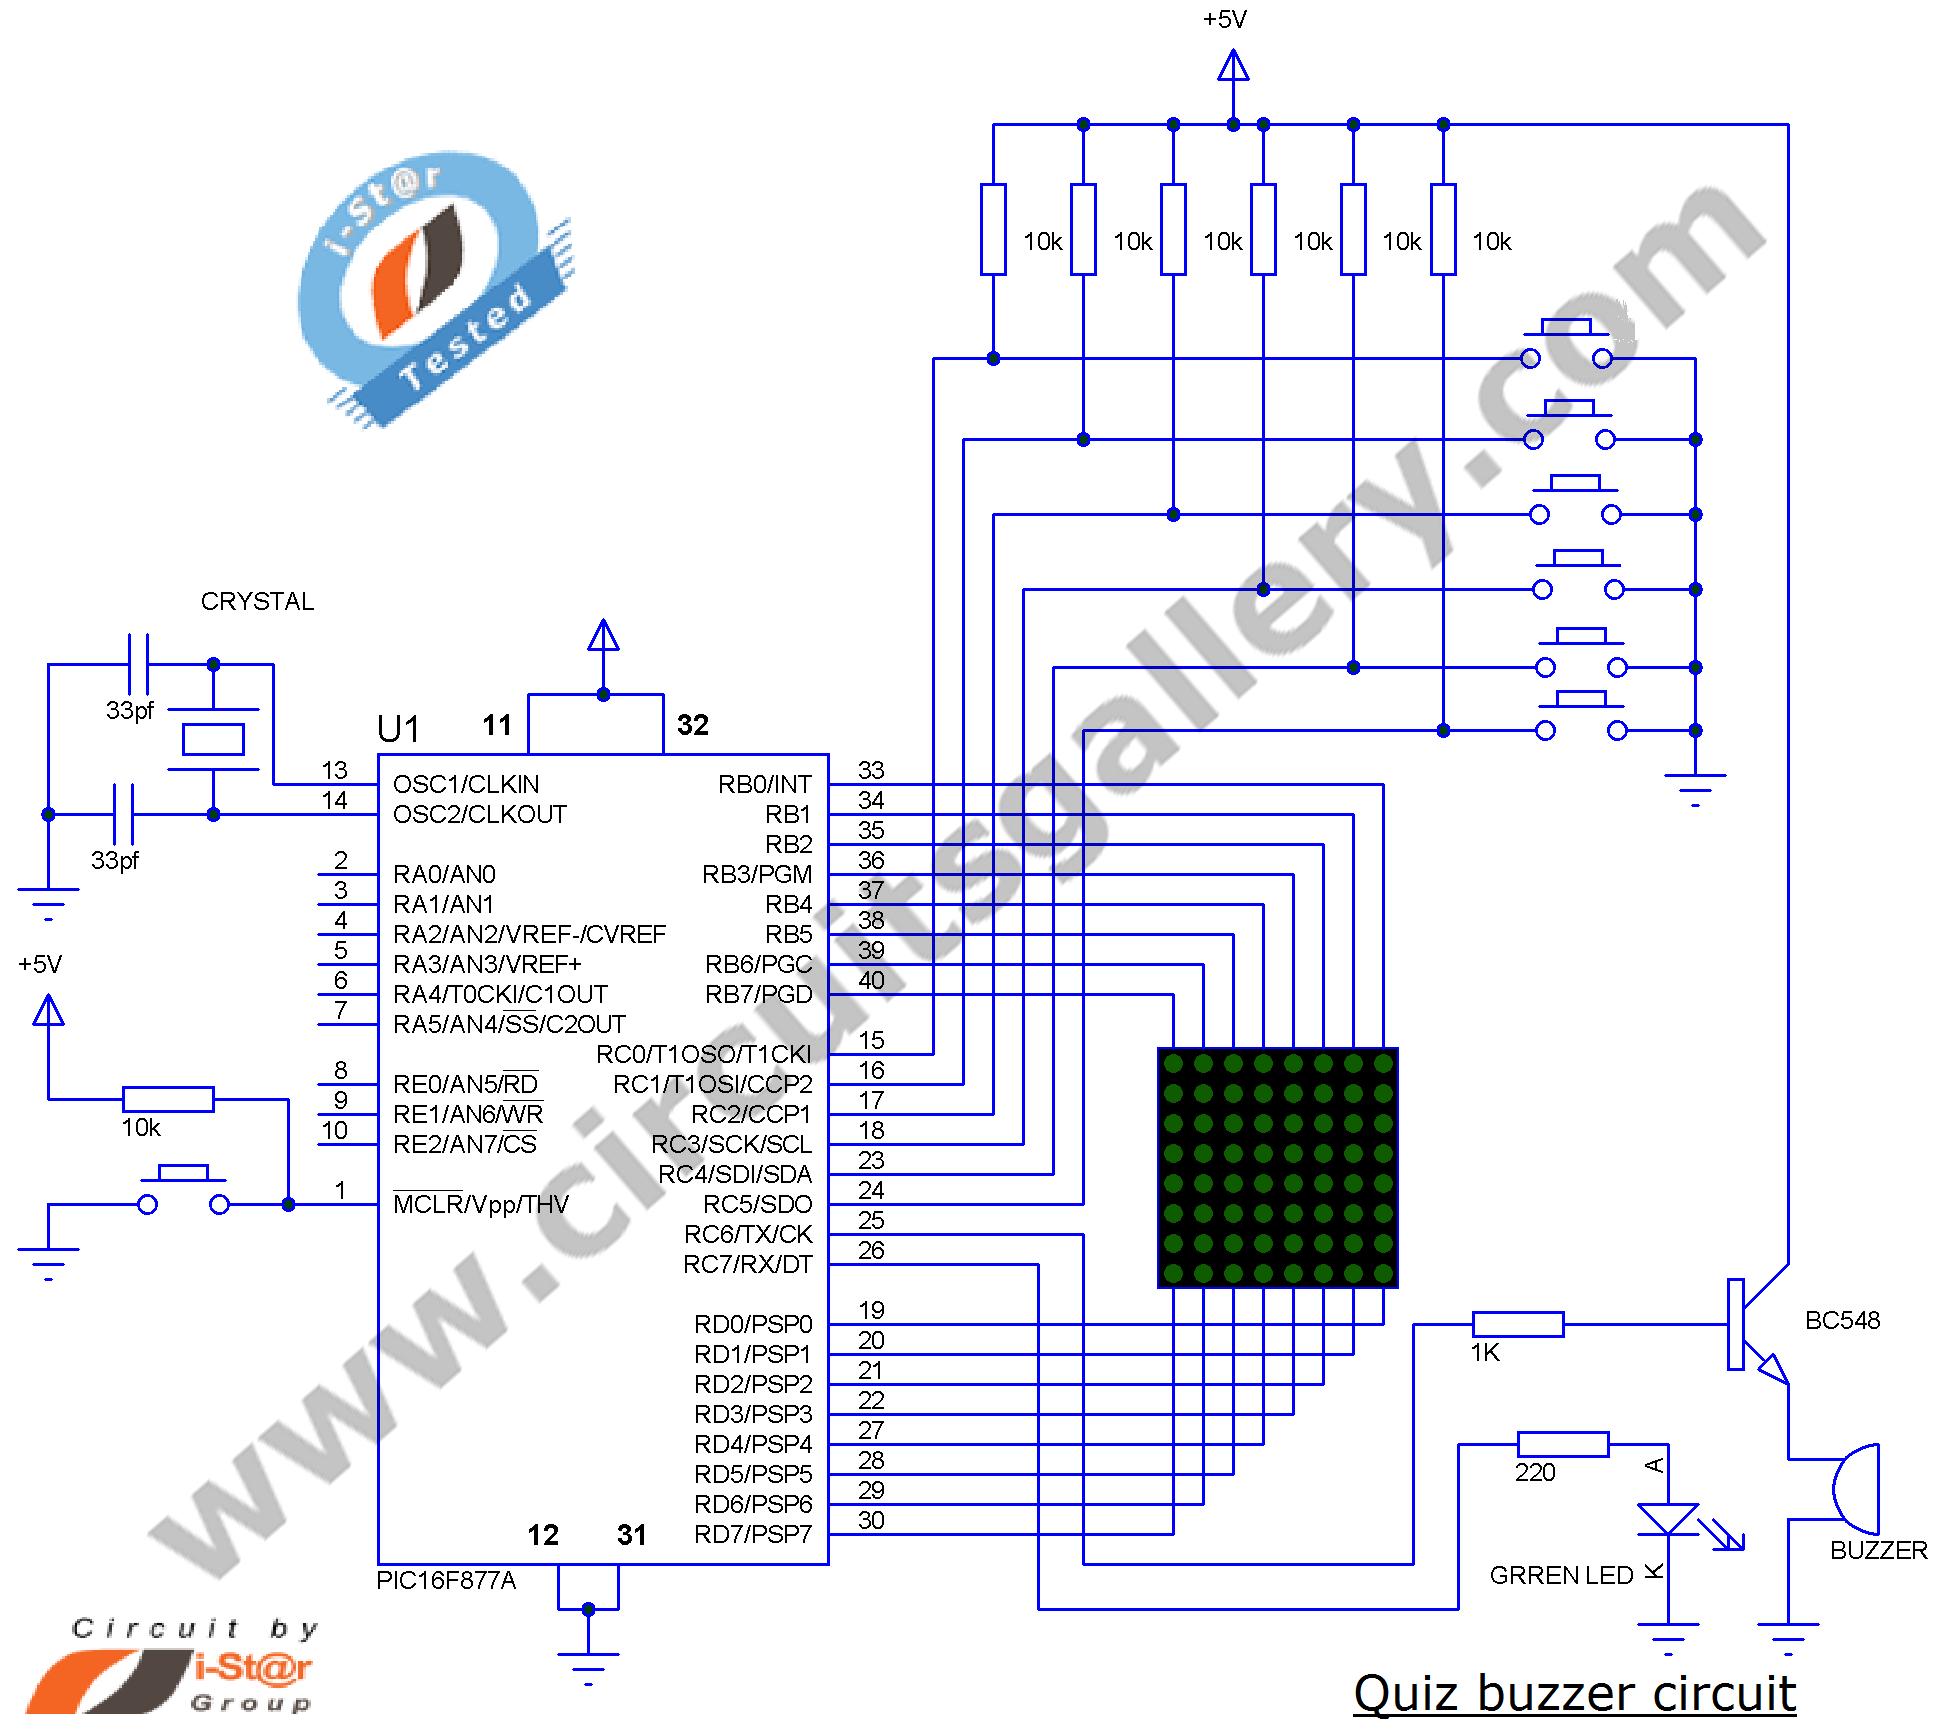 Brilliant Electronic Quiz Buzzer Circuit Diagram Using Pic Microcontroller Wiring Cloud Monangrecoveryedborg